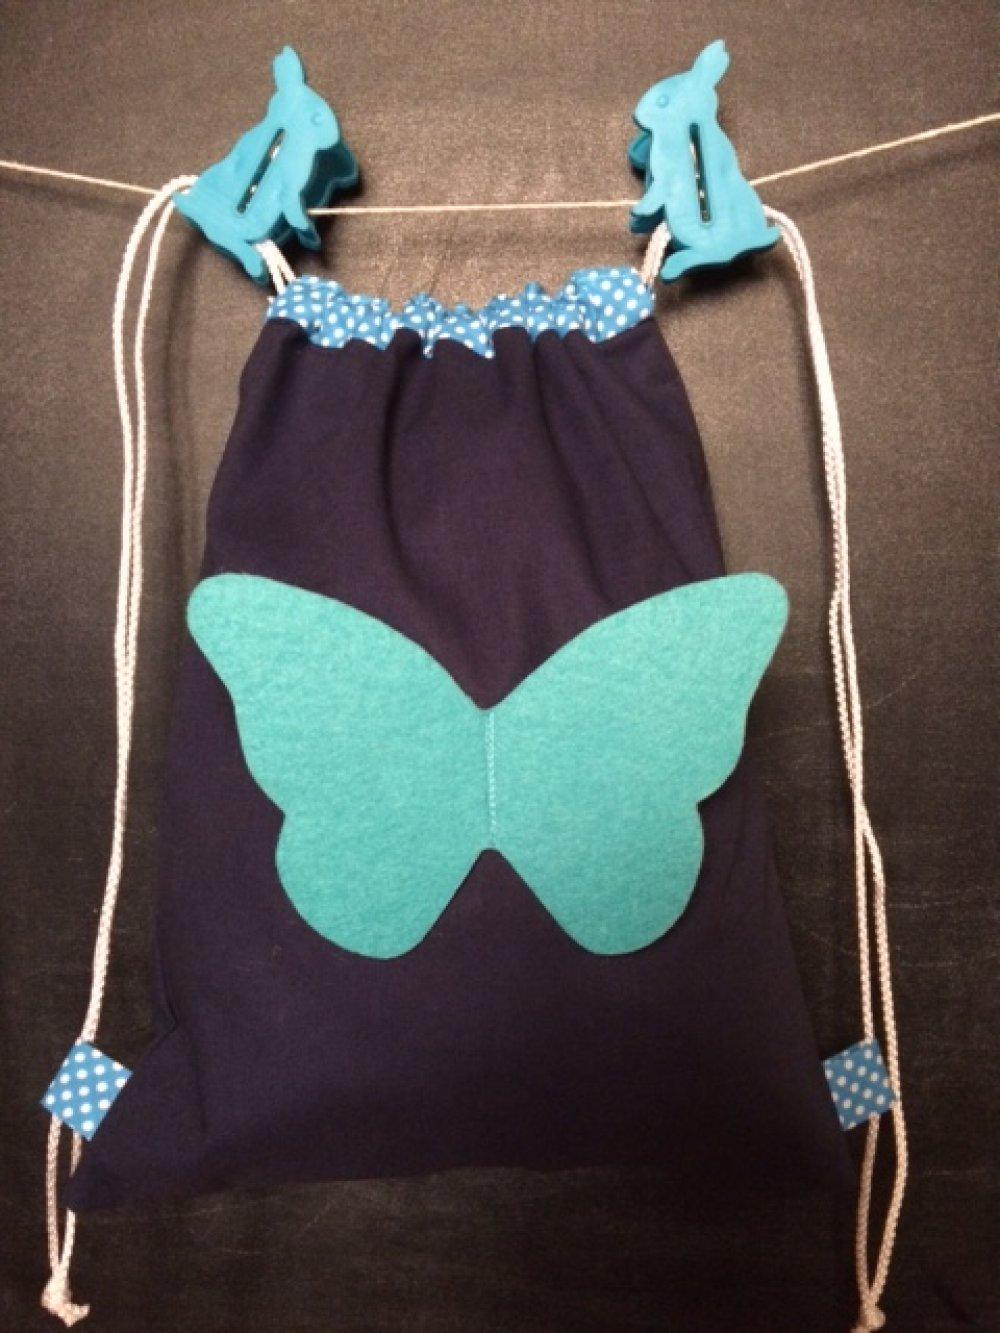 Sac à dos PAPILLON turquoise/marine